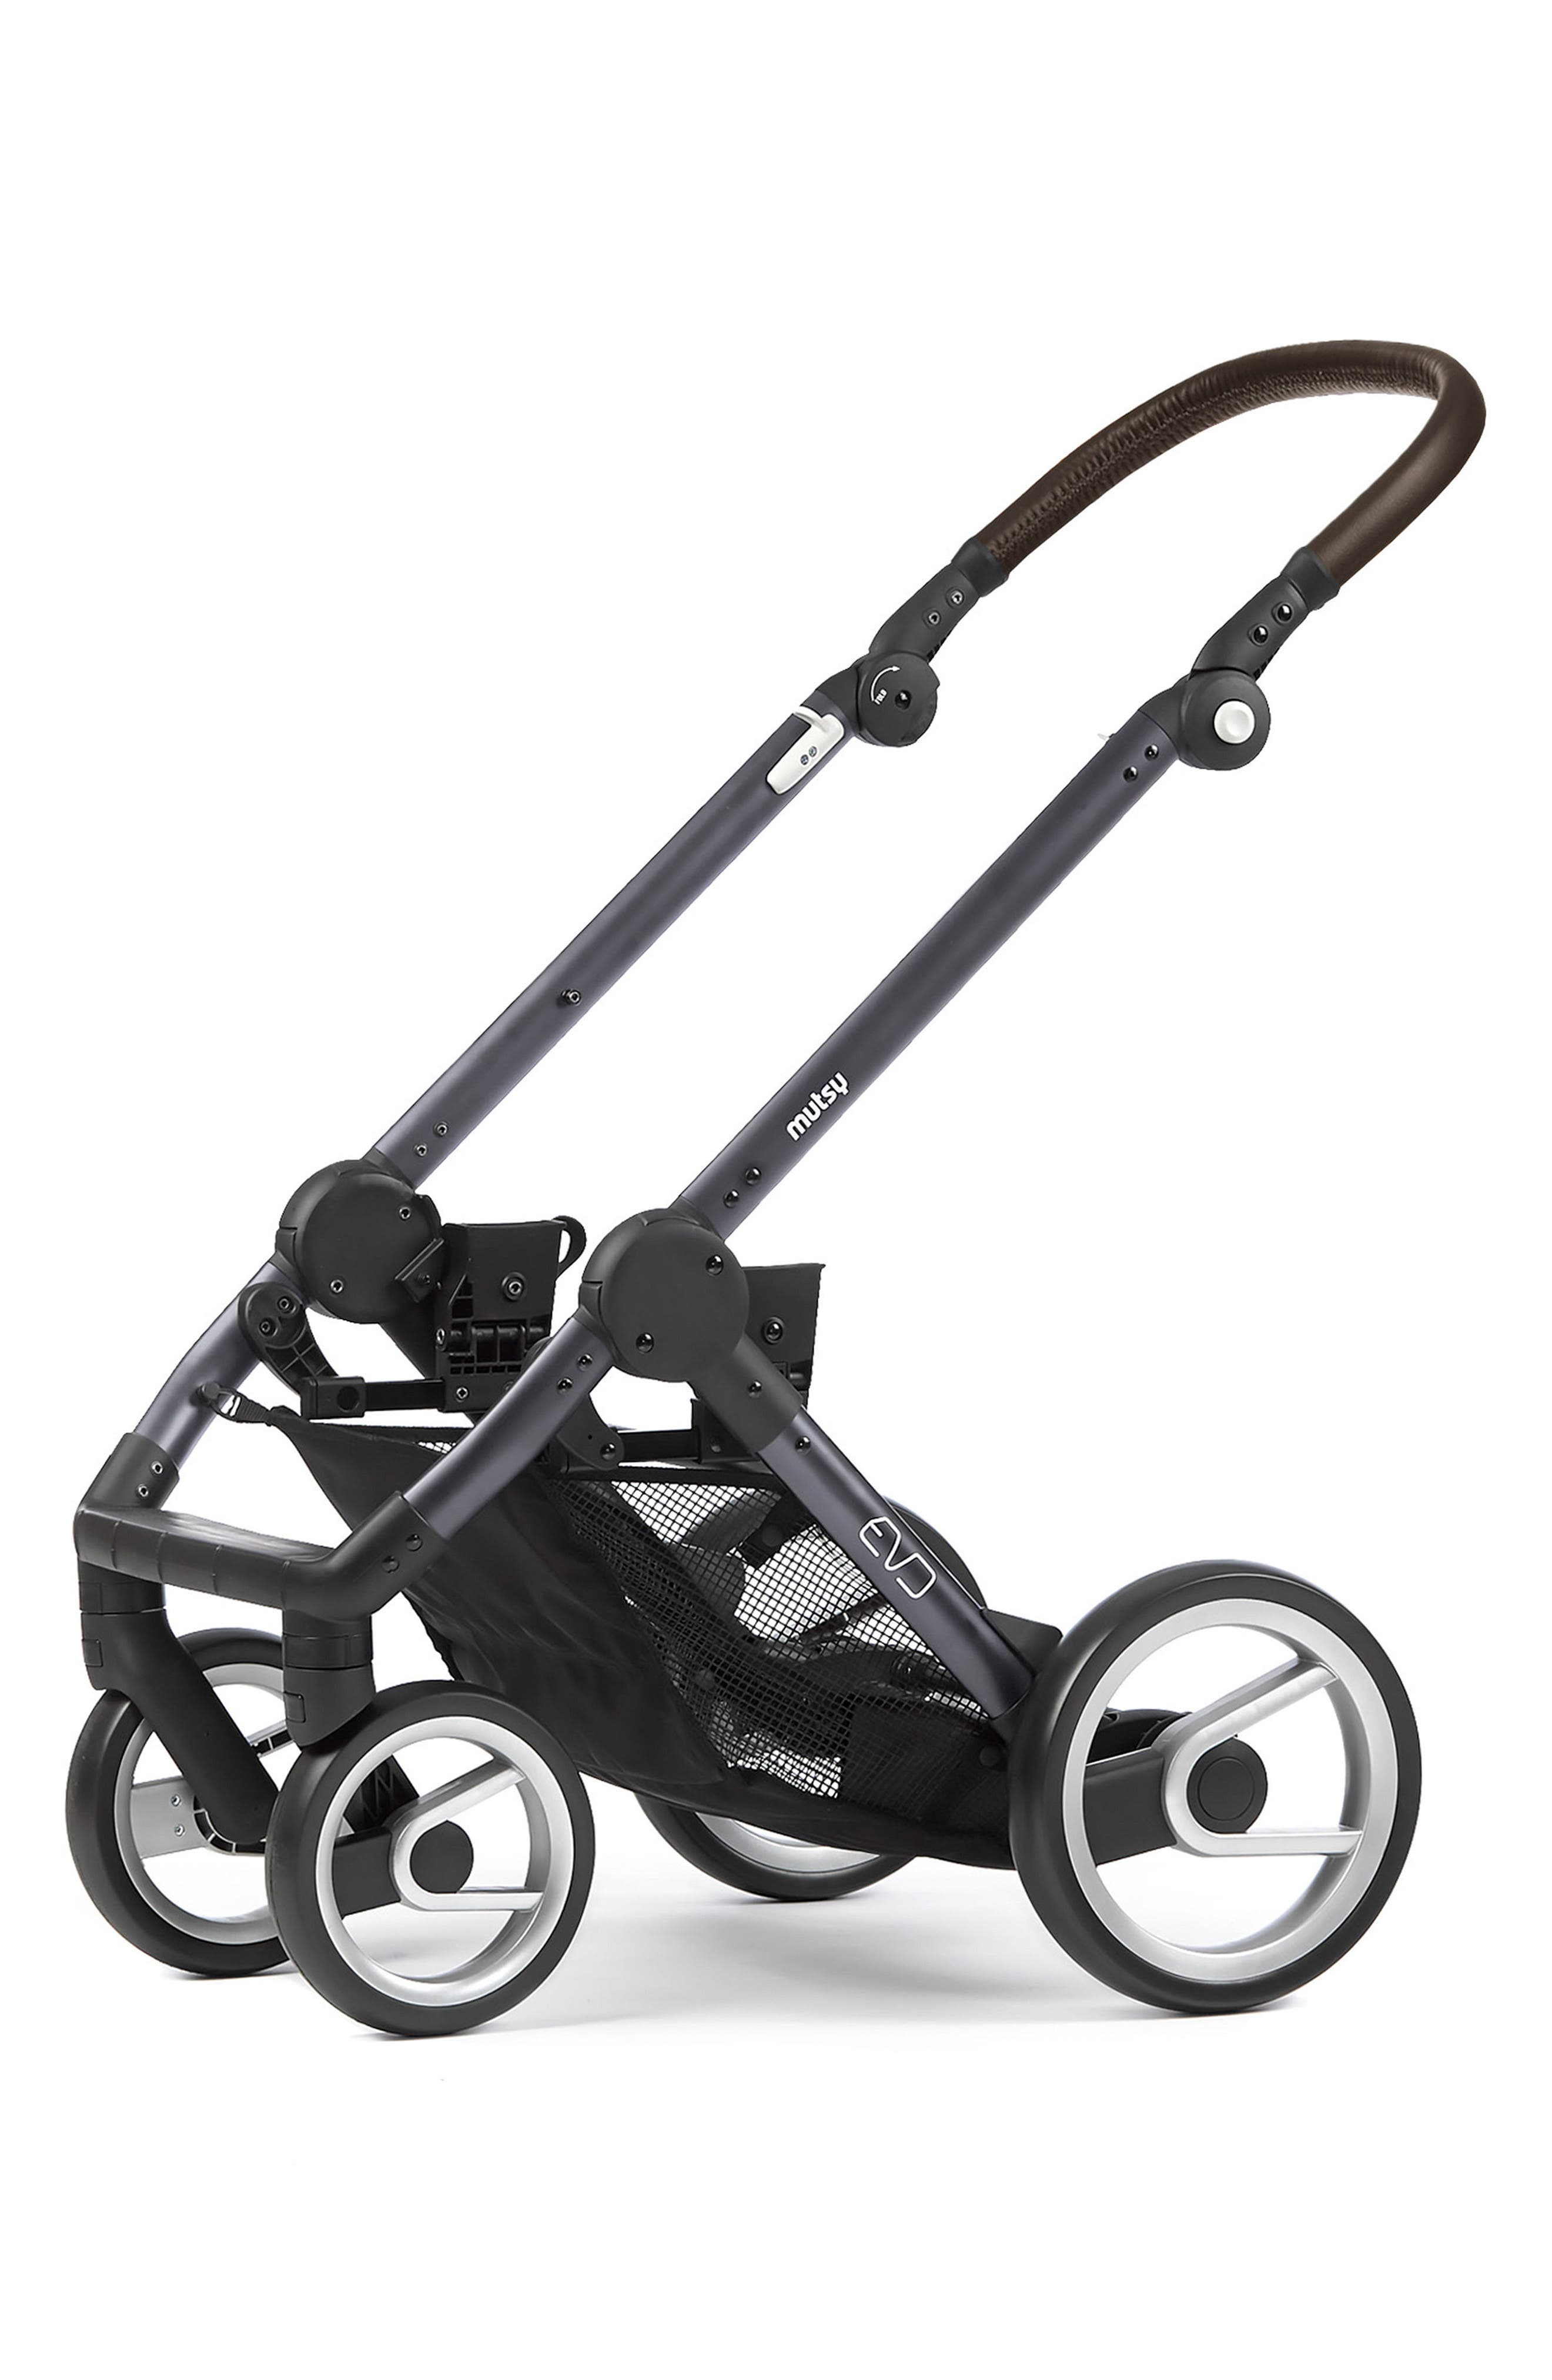 Evo - Farmer Earth Stroller,                             Alternate thumbnail 2, color,                             GREY